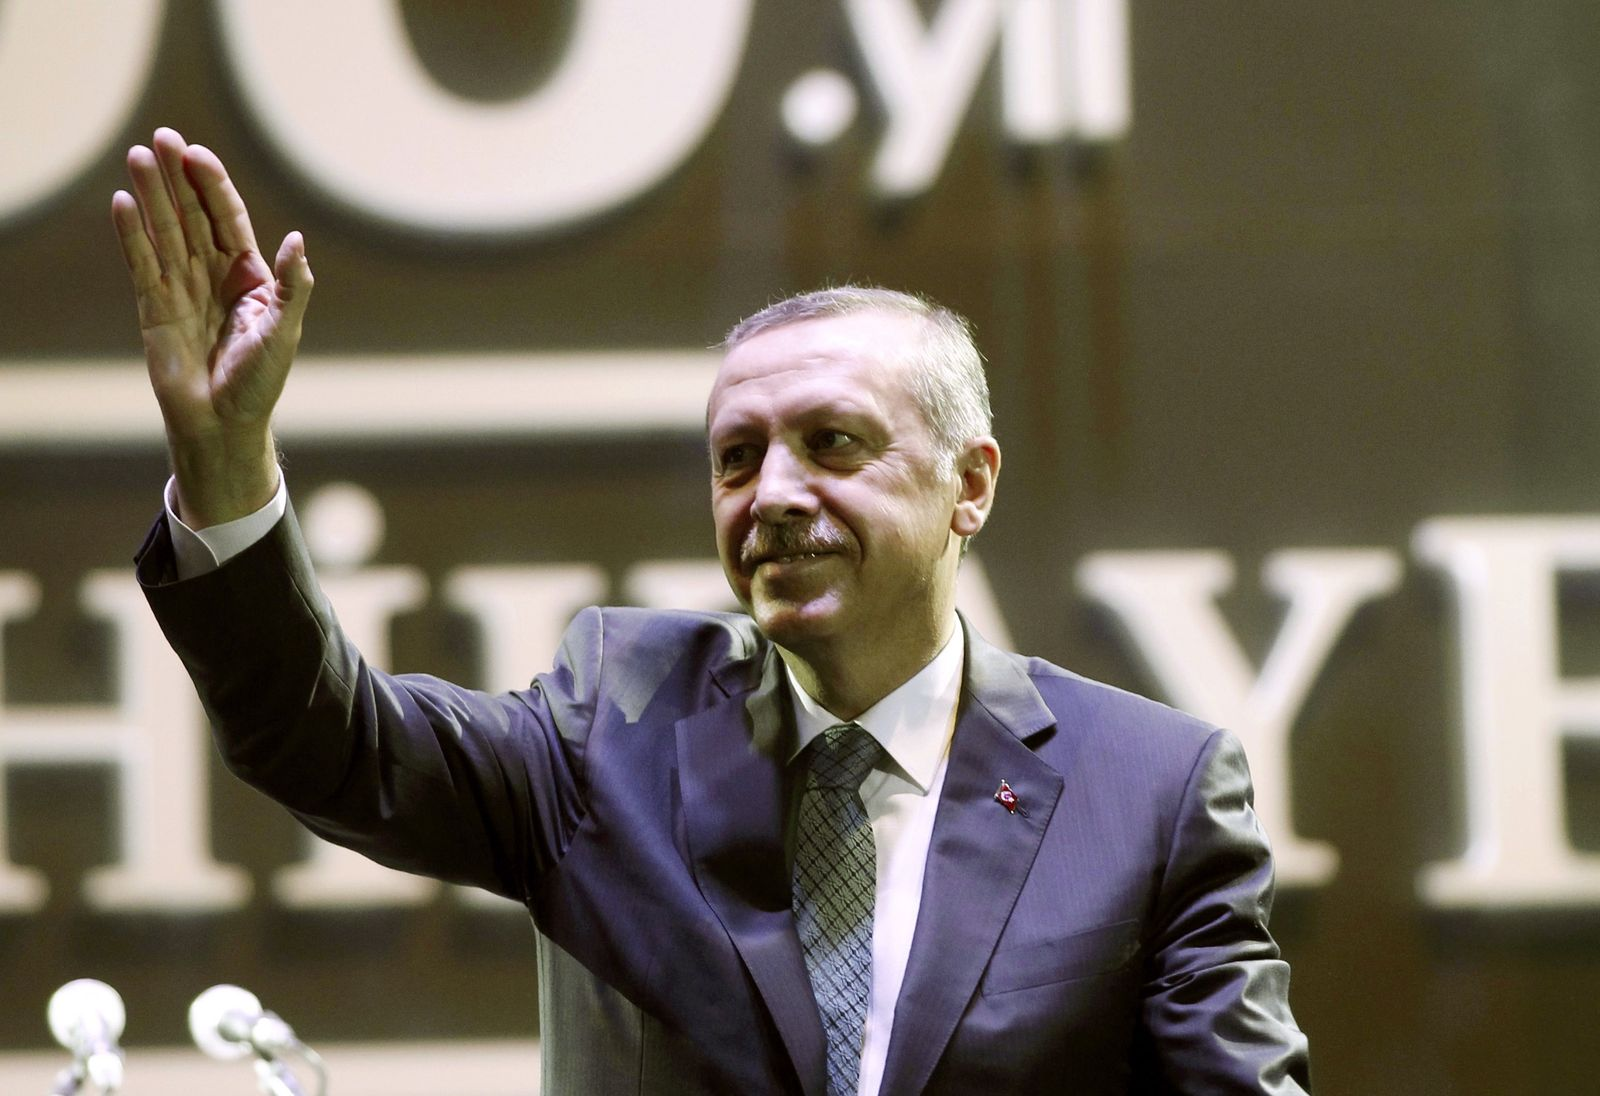 TURKEY-CORRUPTION/